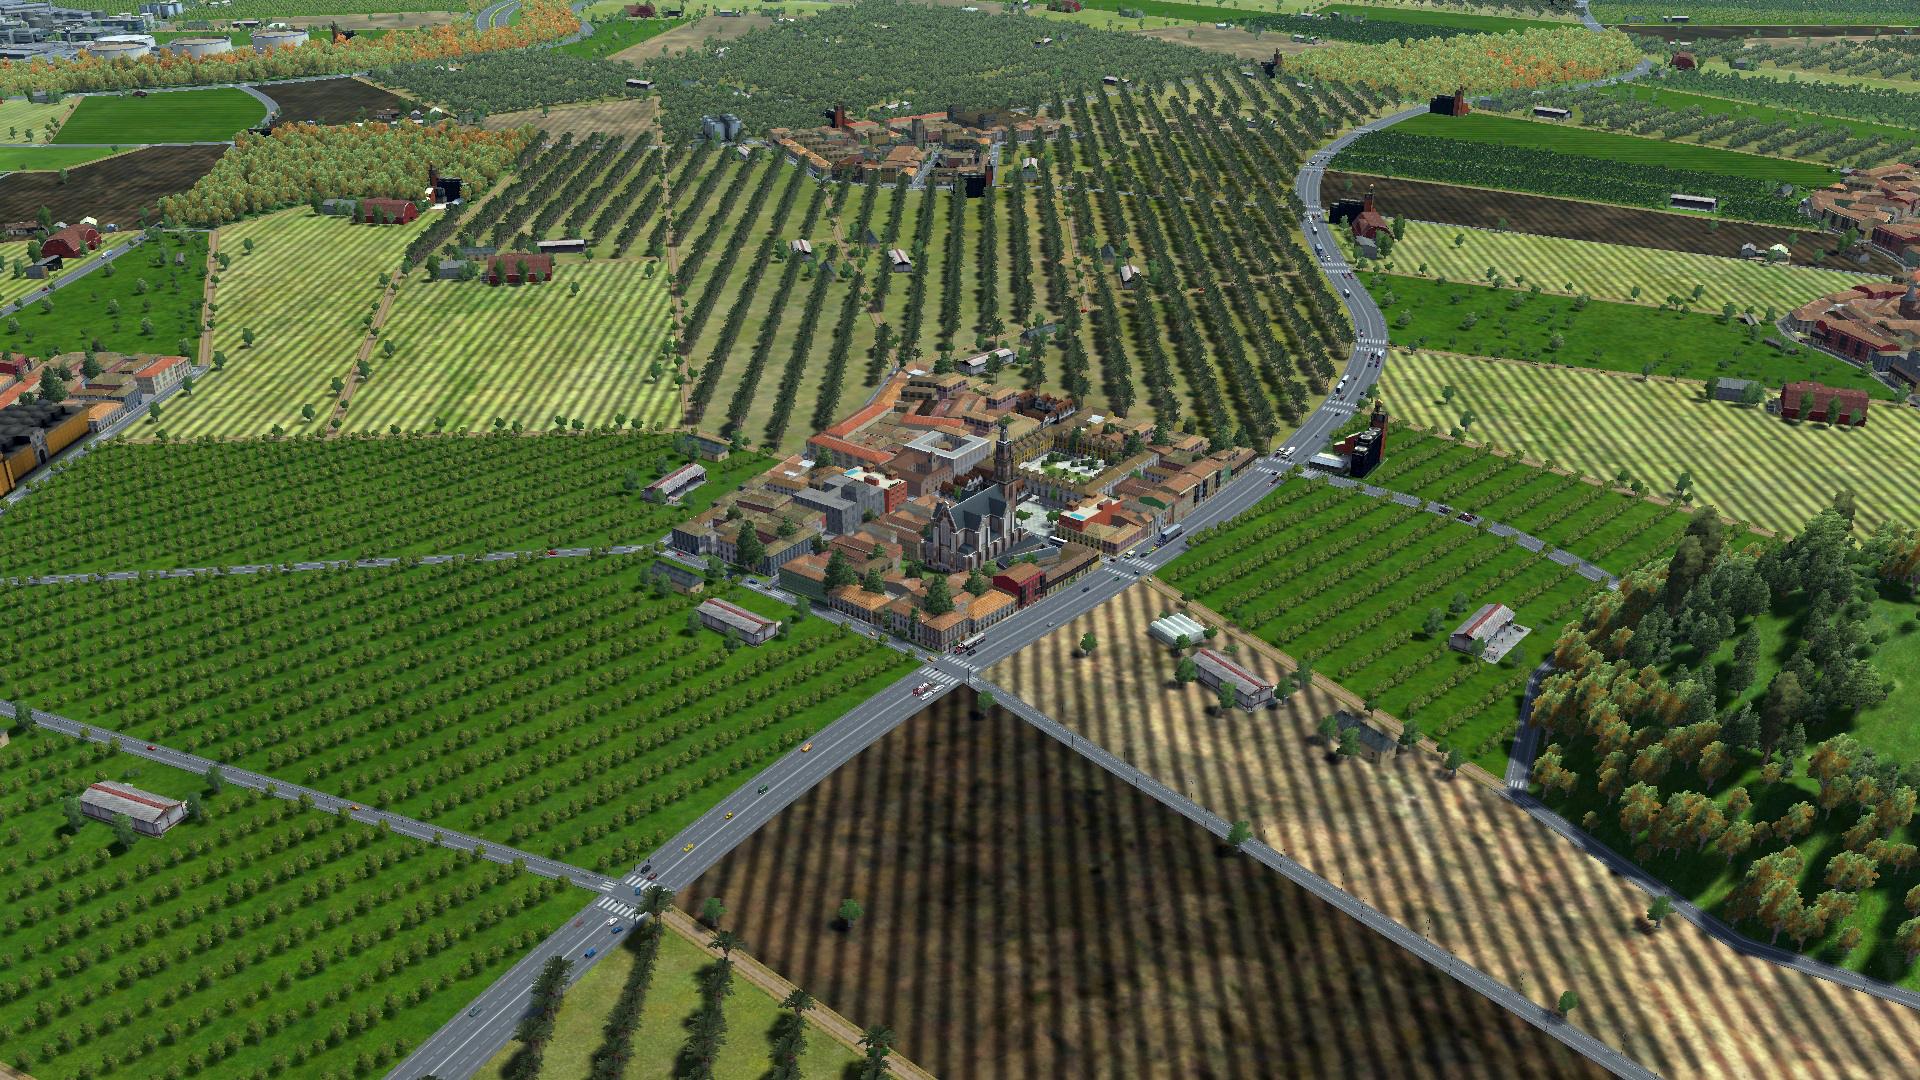 cxl_screenshot_cuva cavelio_Rural_11.jpg